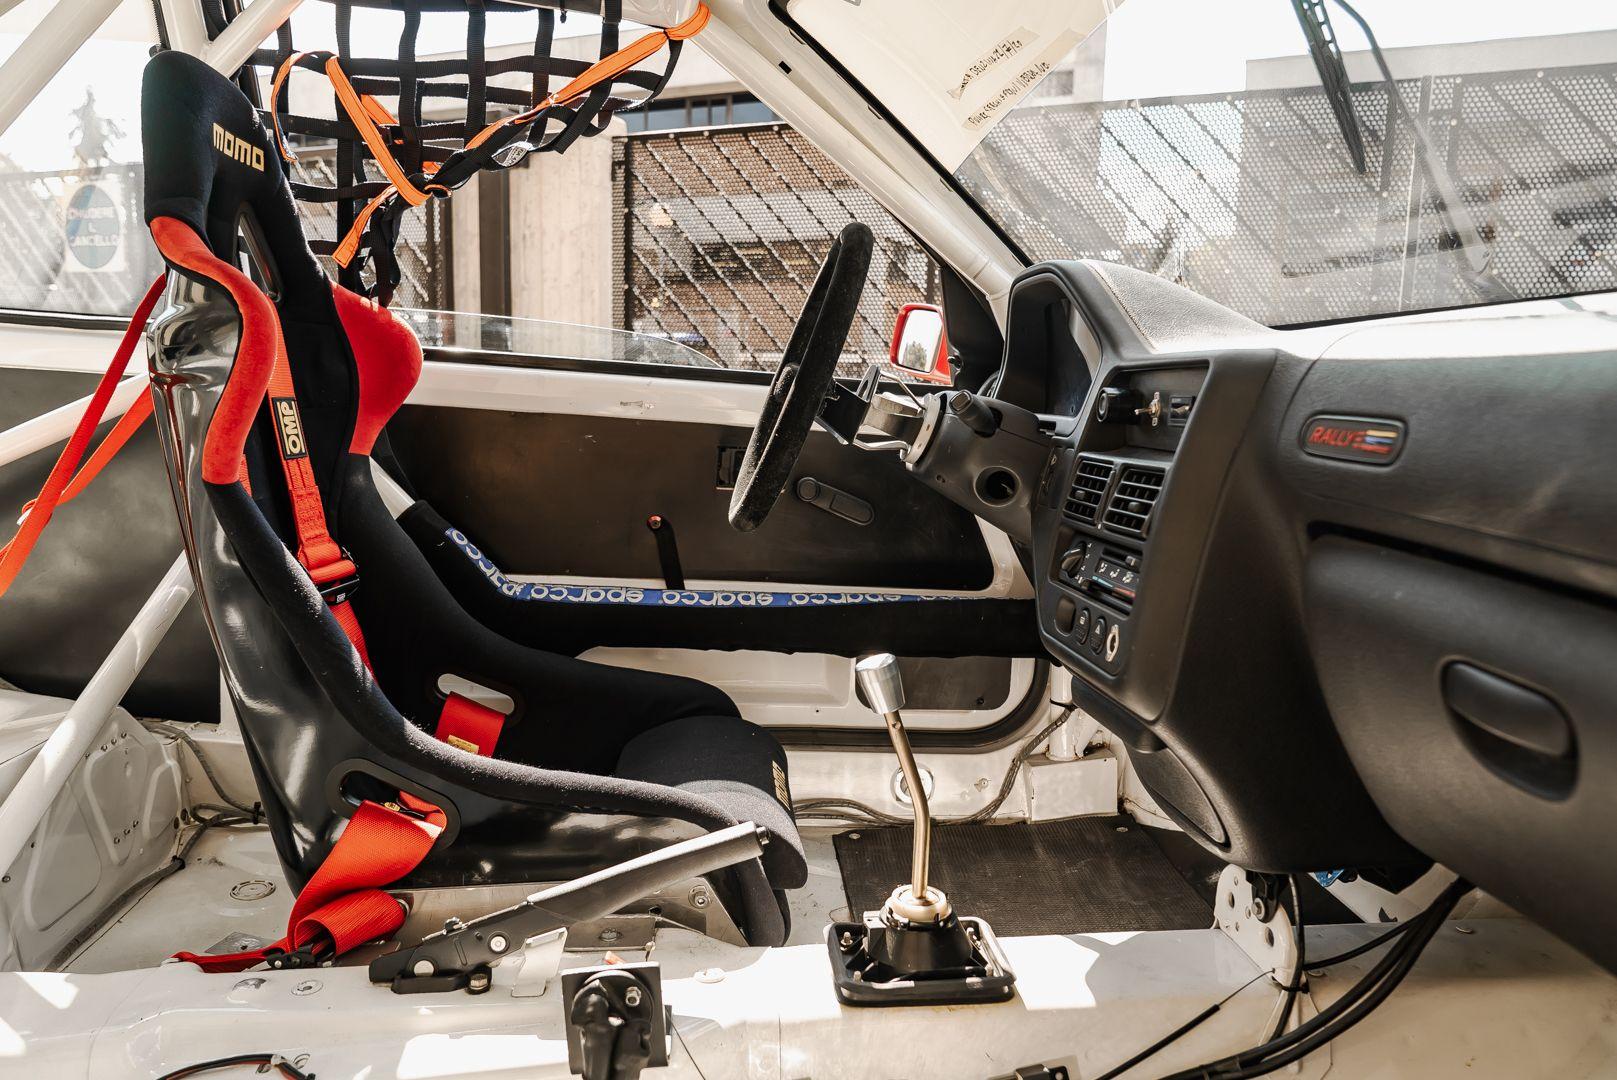 1998 Peugeot 106 Rallye S16 Group A 83091